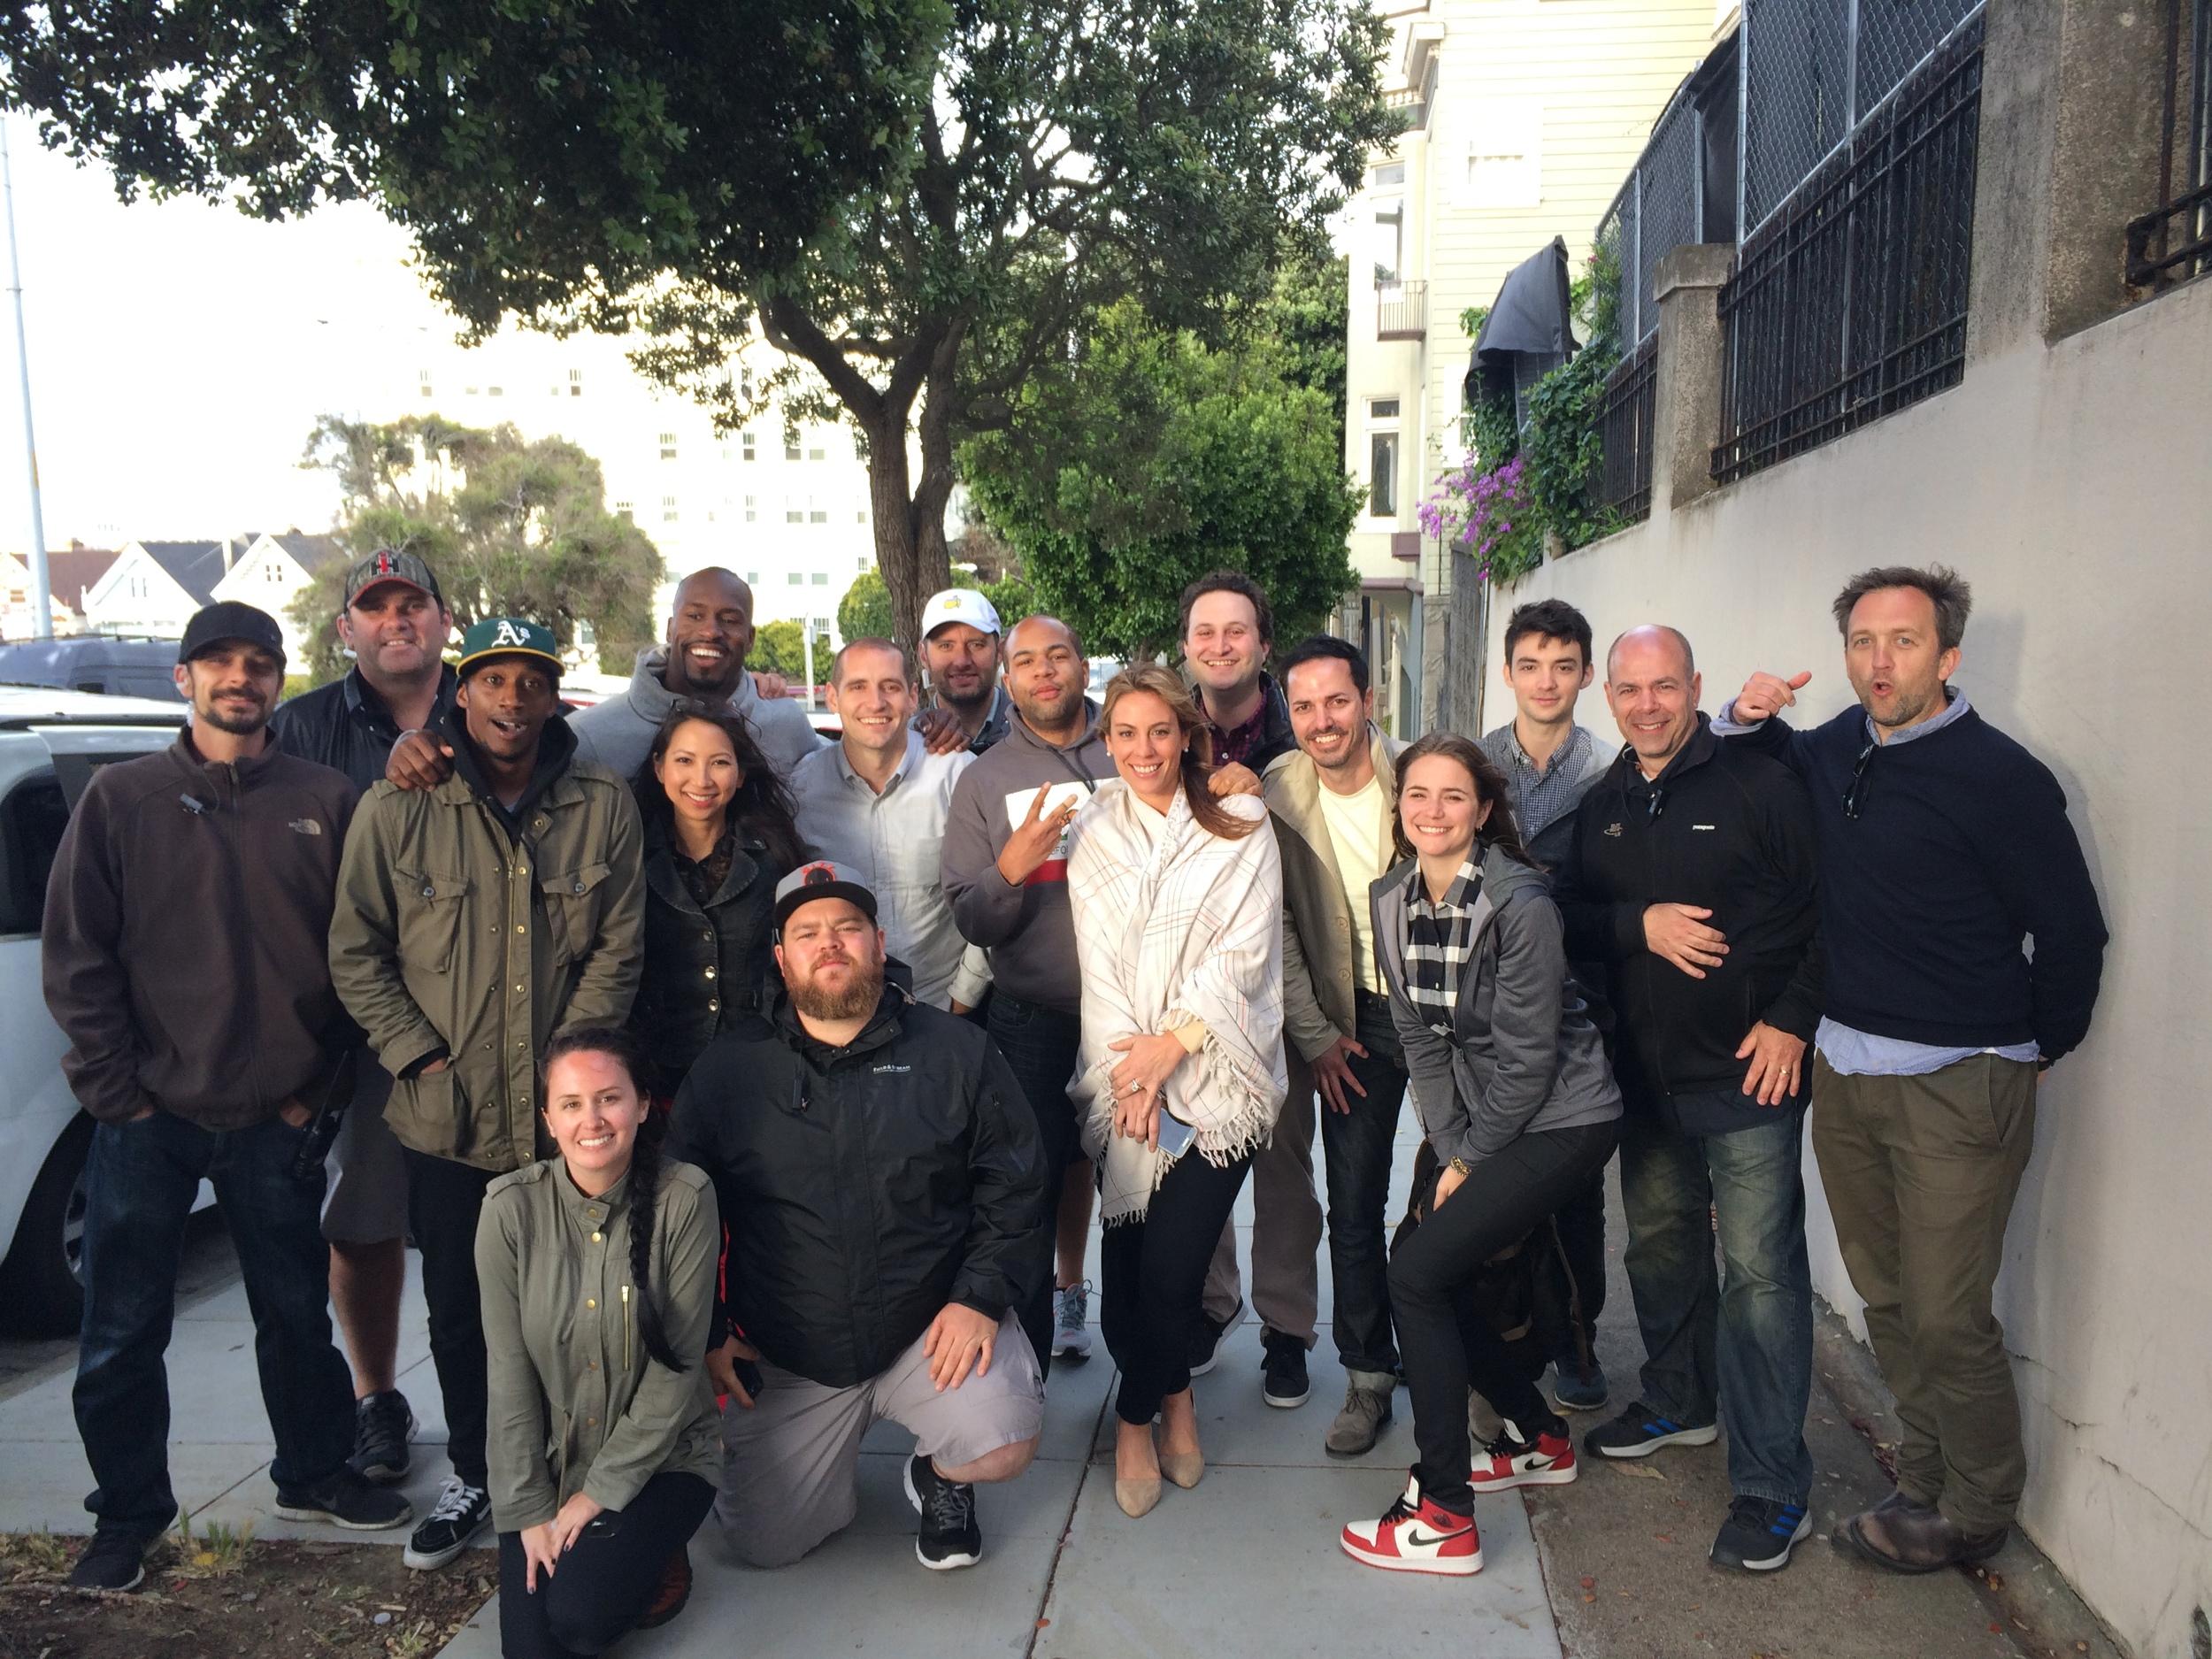 Photo with the crew.